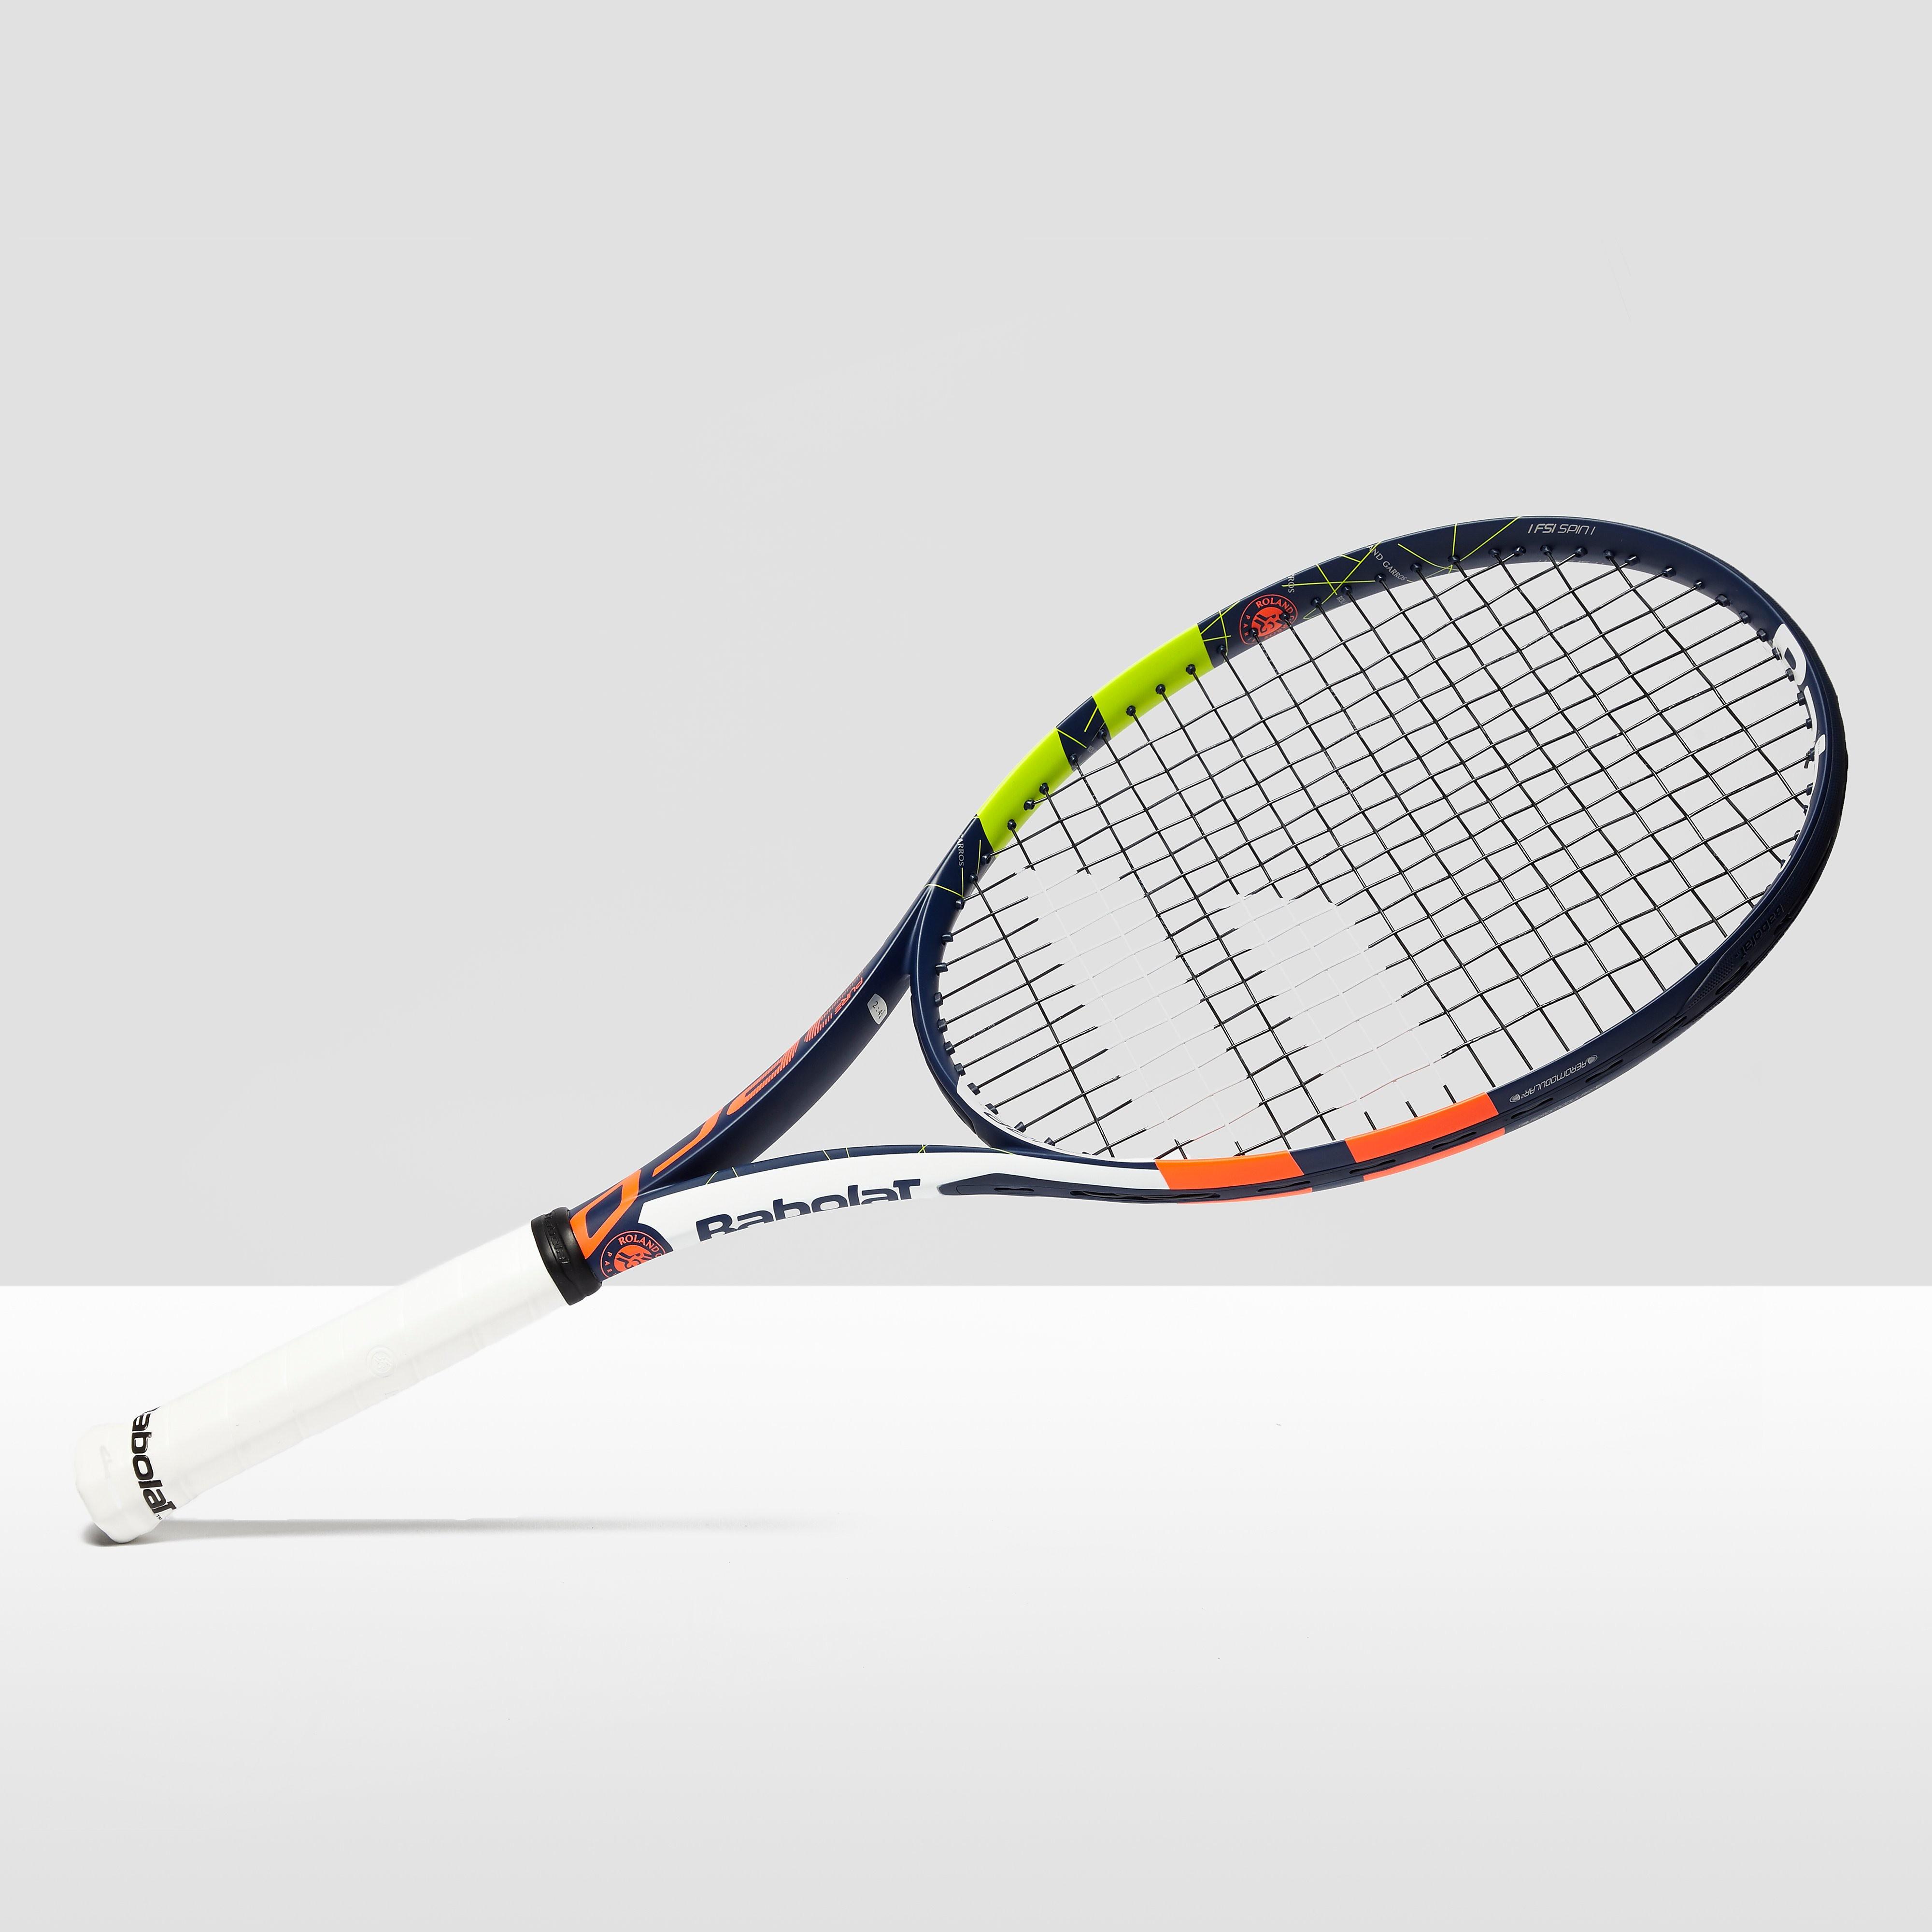 Babolat Roland Garros Pure Aero Lite Tennis Racket